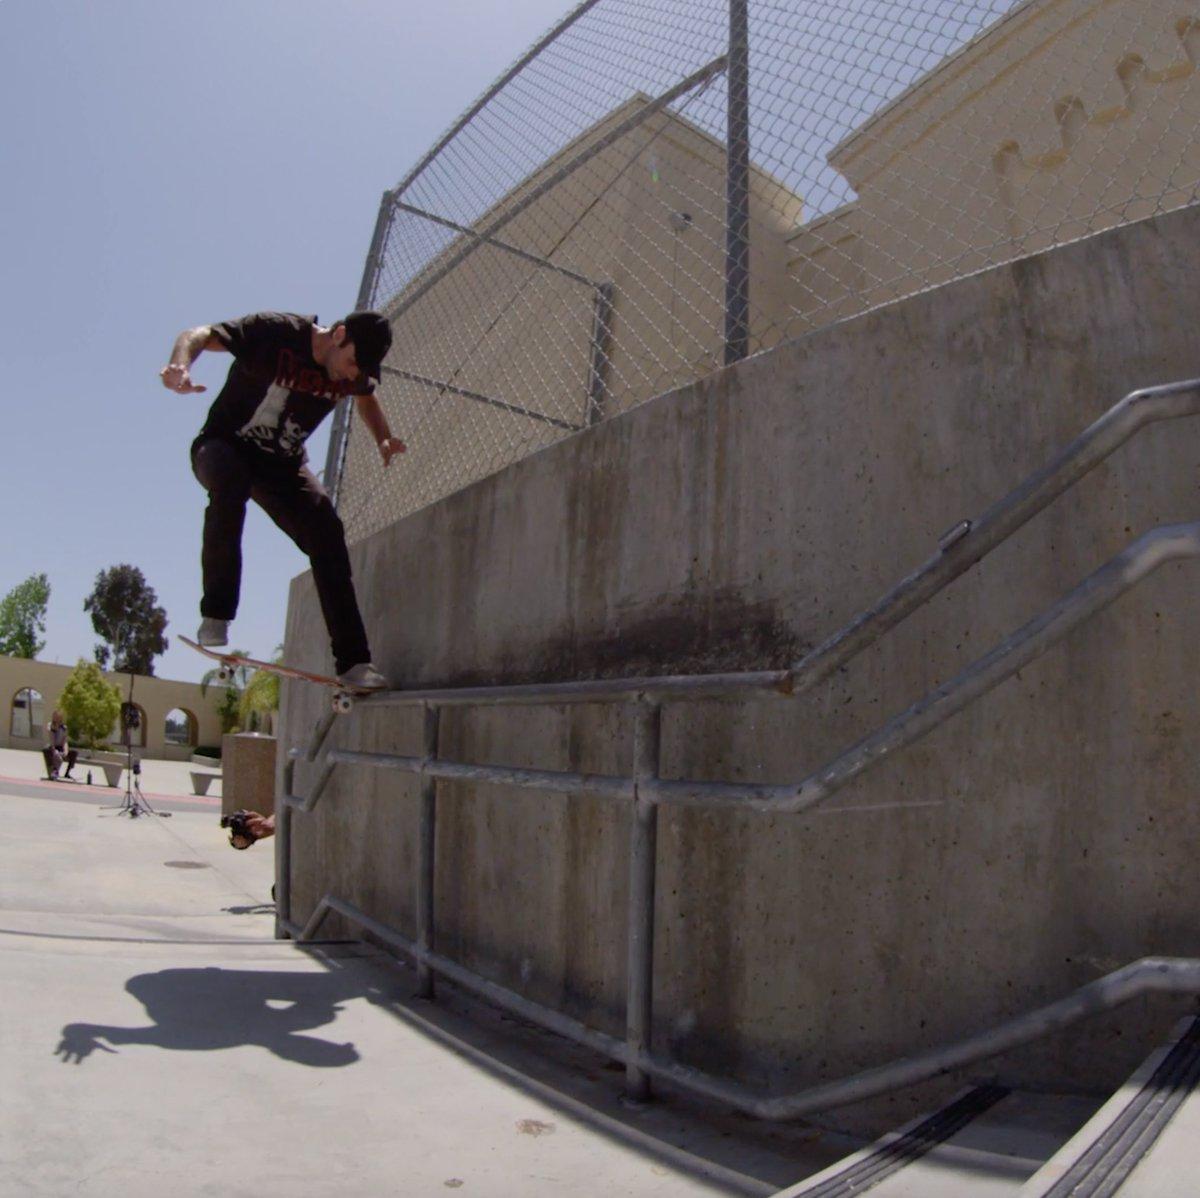 Keeping it low-key, rippin' the streets of Huntington Beach w/@mattberger_ 💥  #Skate #Skateboarding #Skateboard #MonsterEnergy